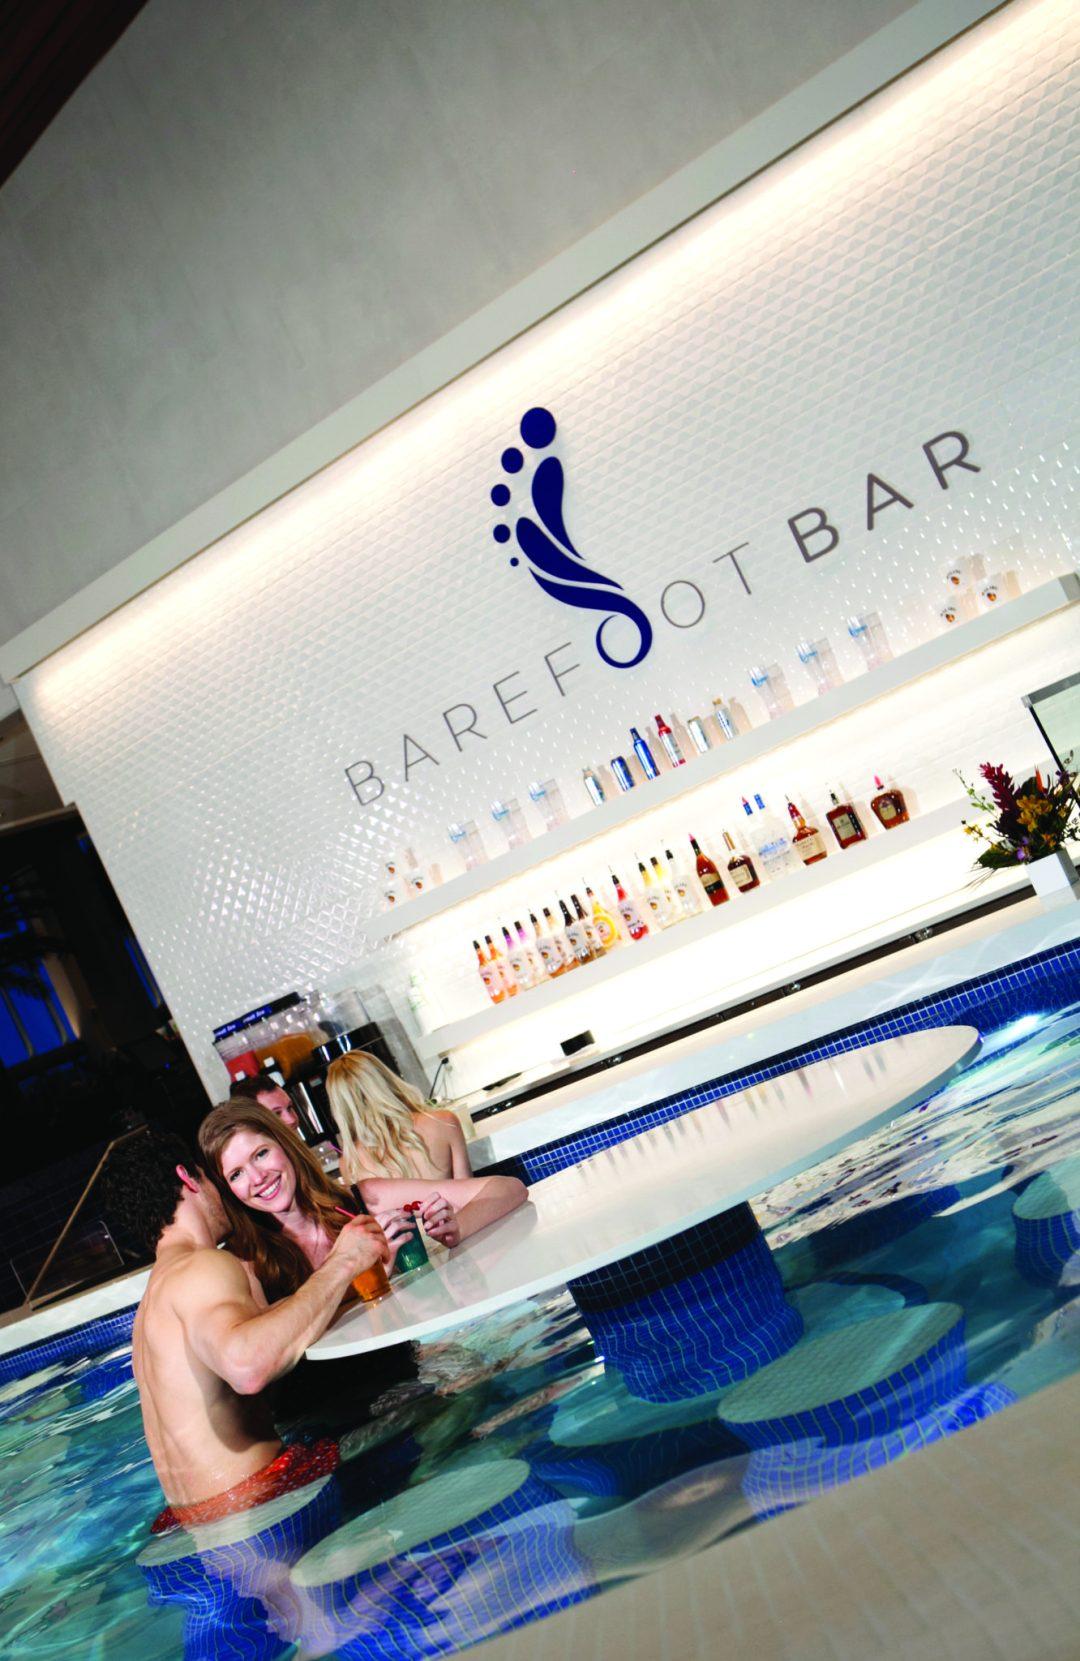 "Barefoot Bar. Image by <a href=""http://www.ticasino.com/"" target=""_blank"">Treasure Island</a>"